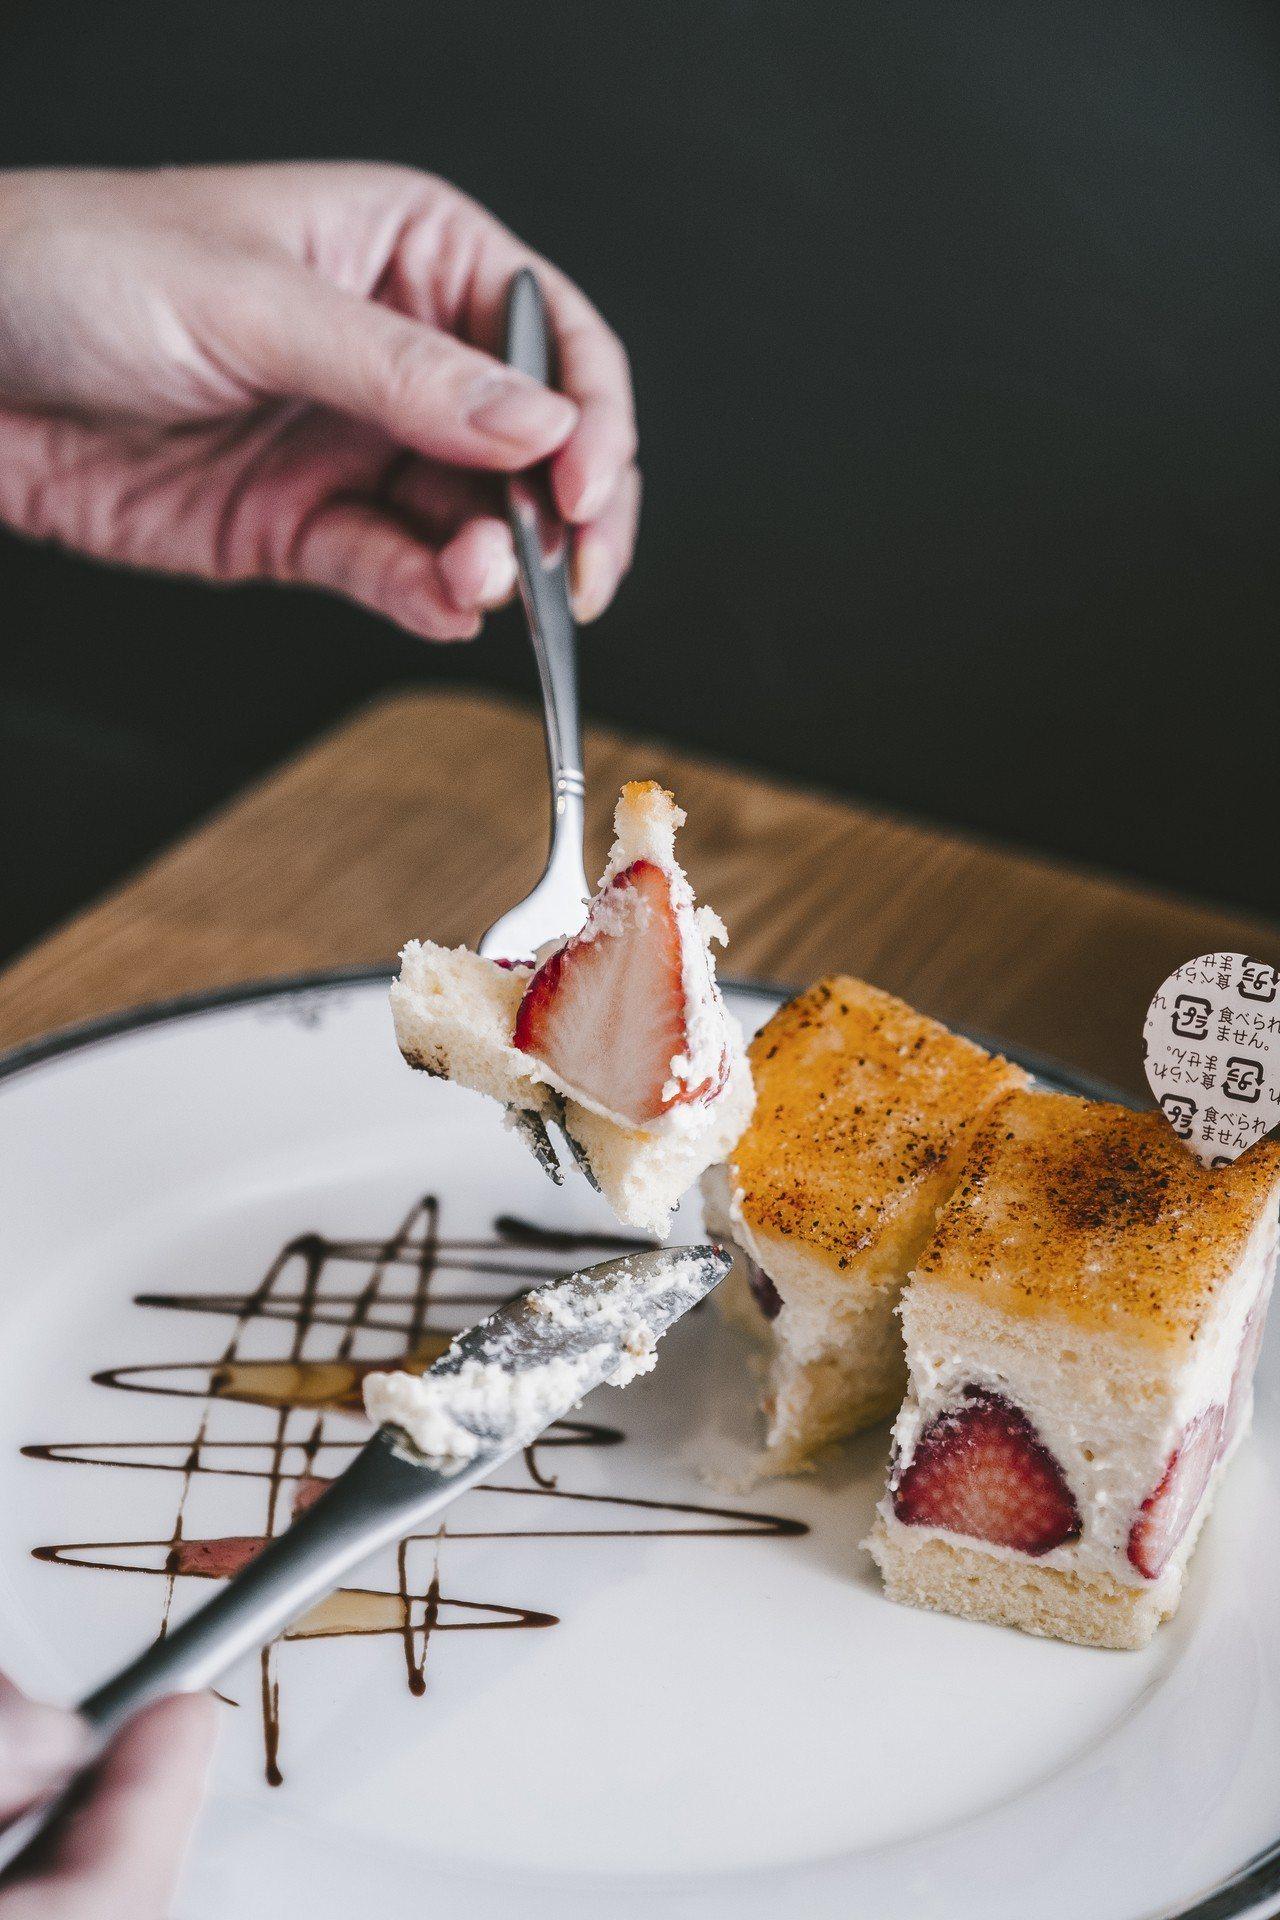 KOBE SWEETS CAFE神戶卡士達奶油蛋糕。攝影/美味拍手